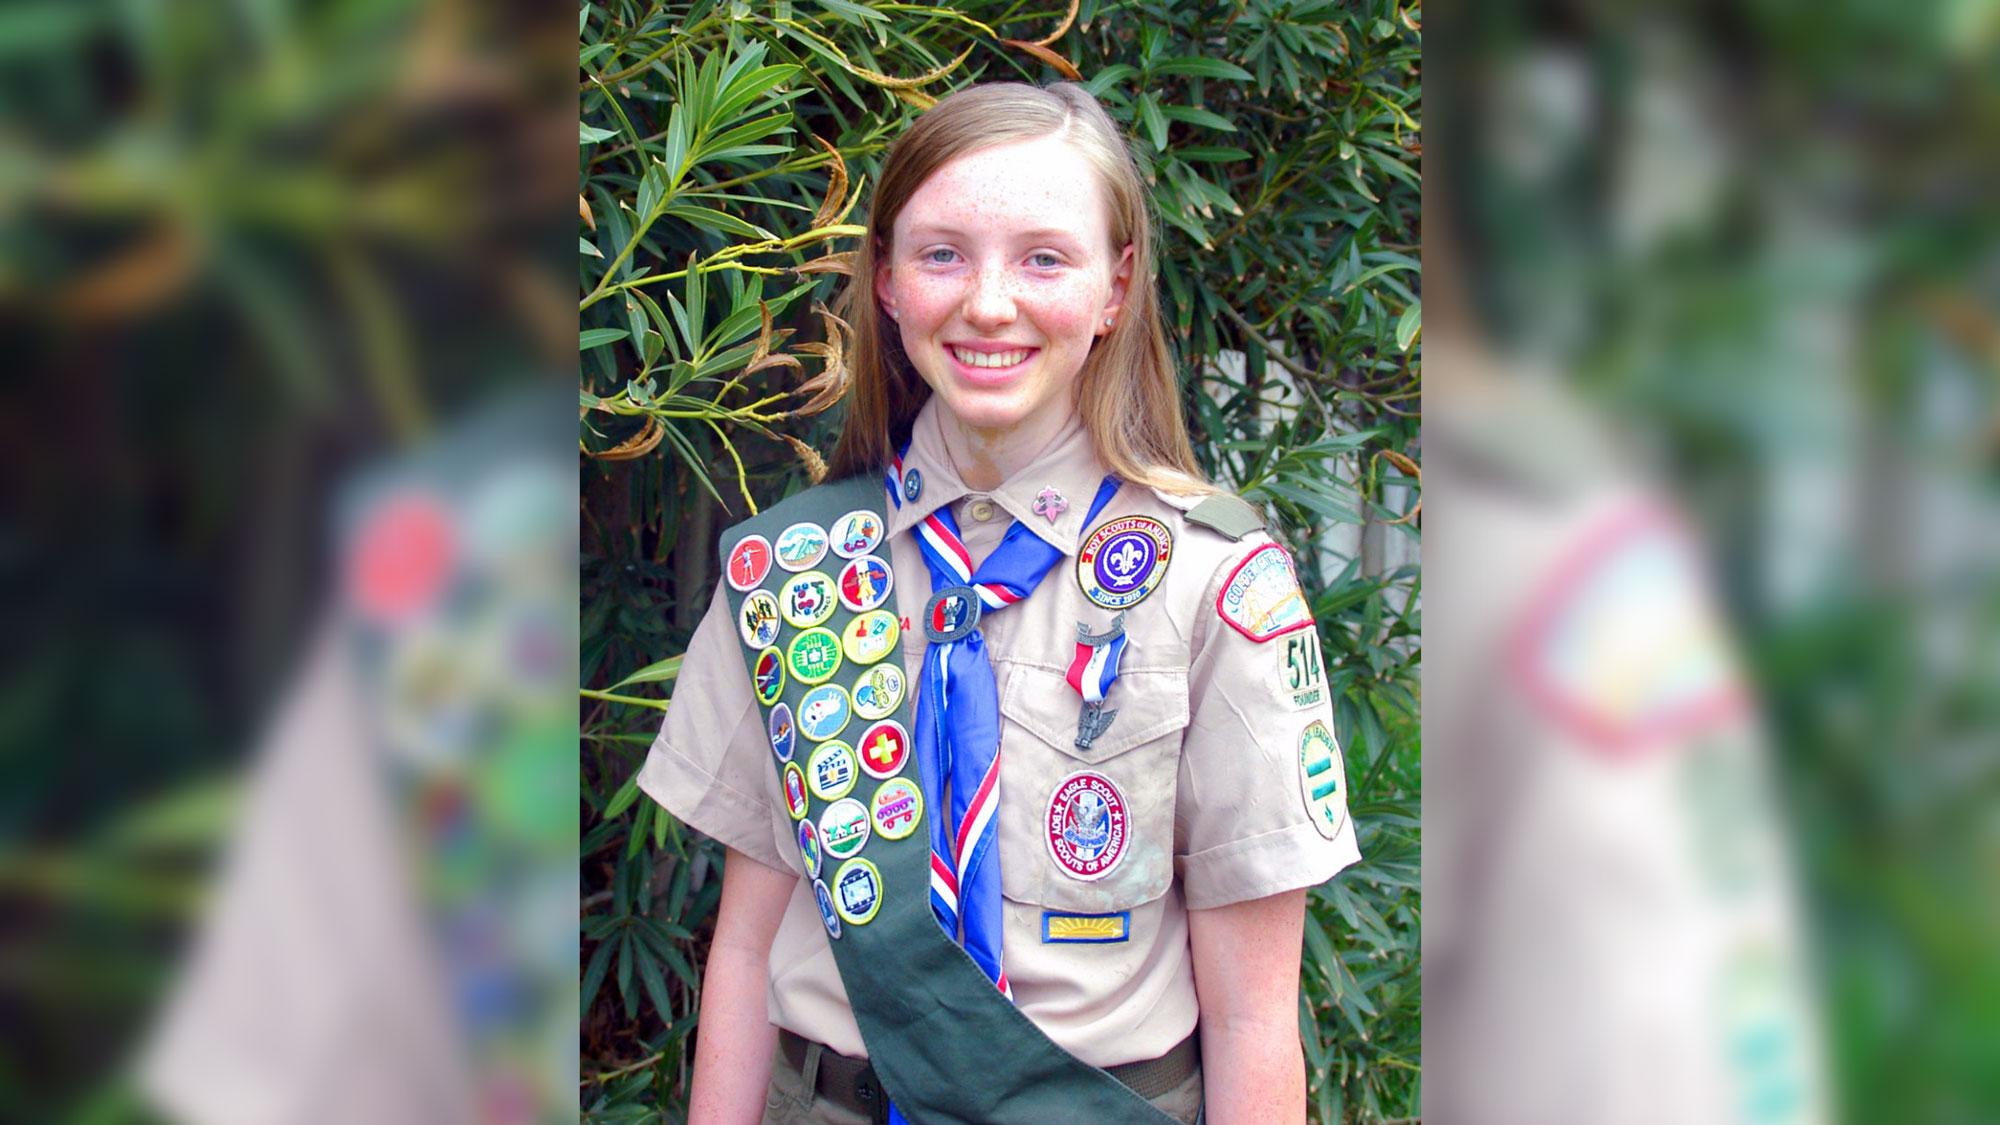 Eagle Scout Kathryn Block